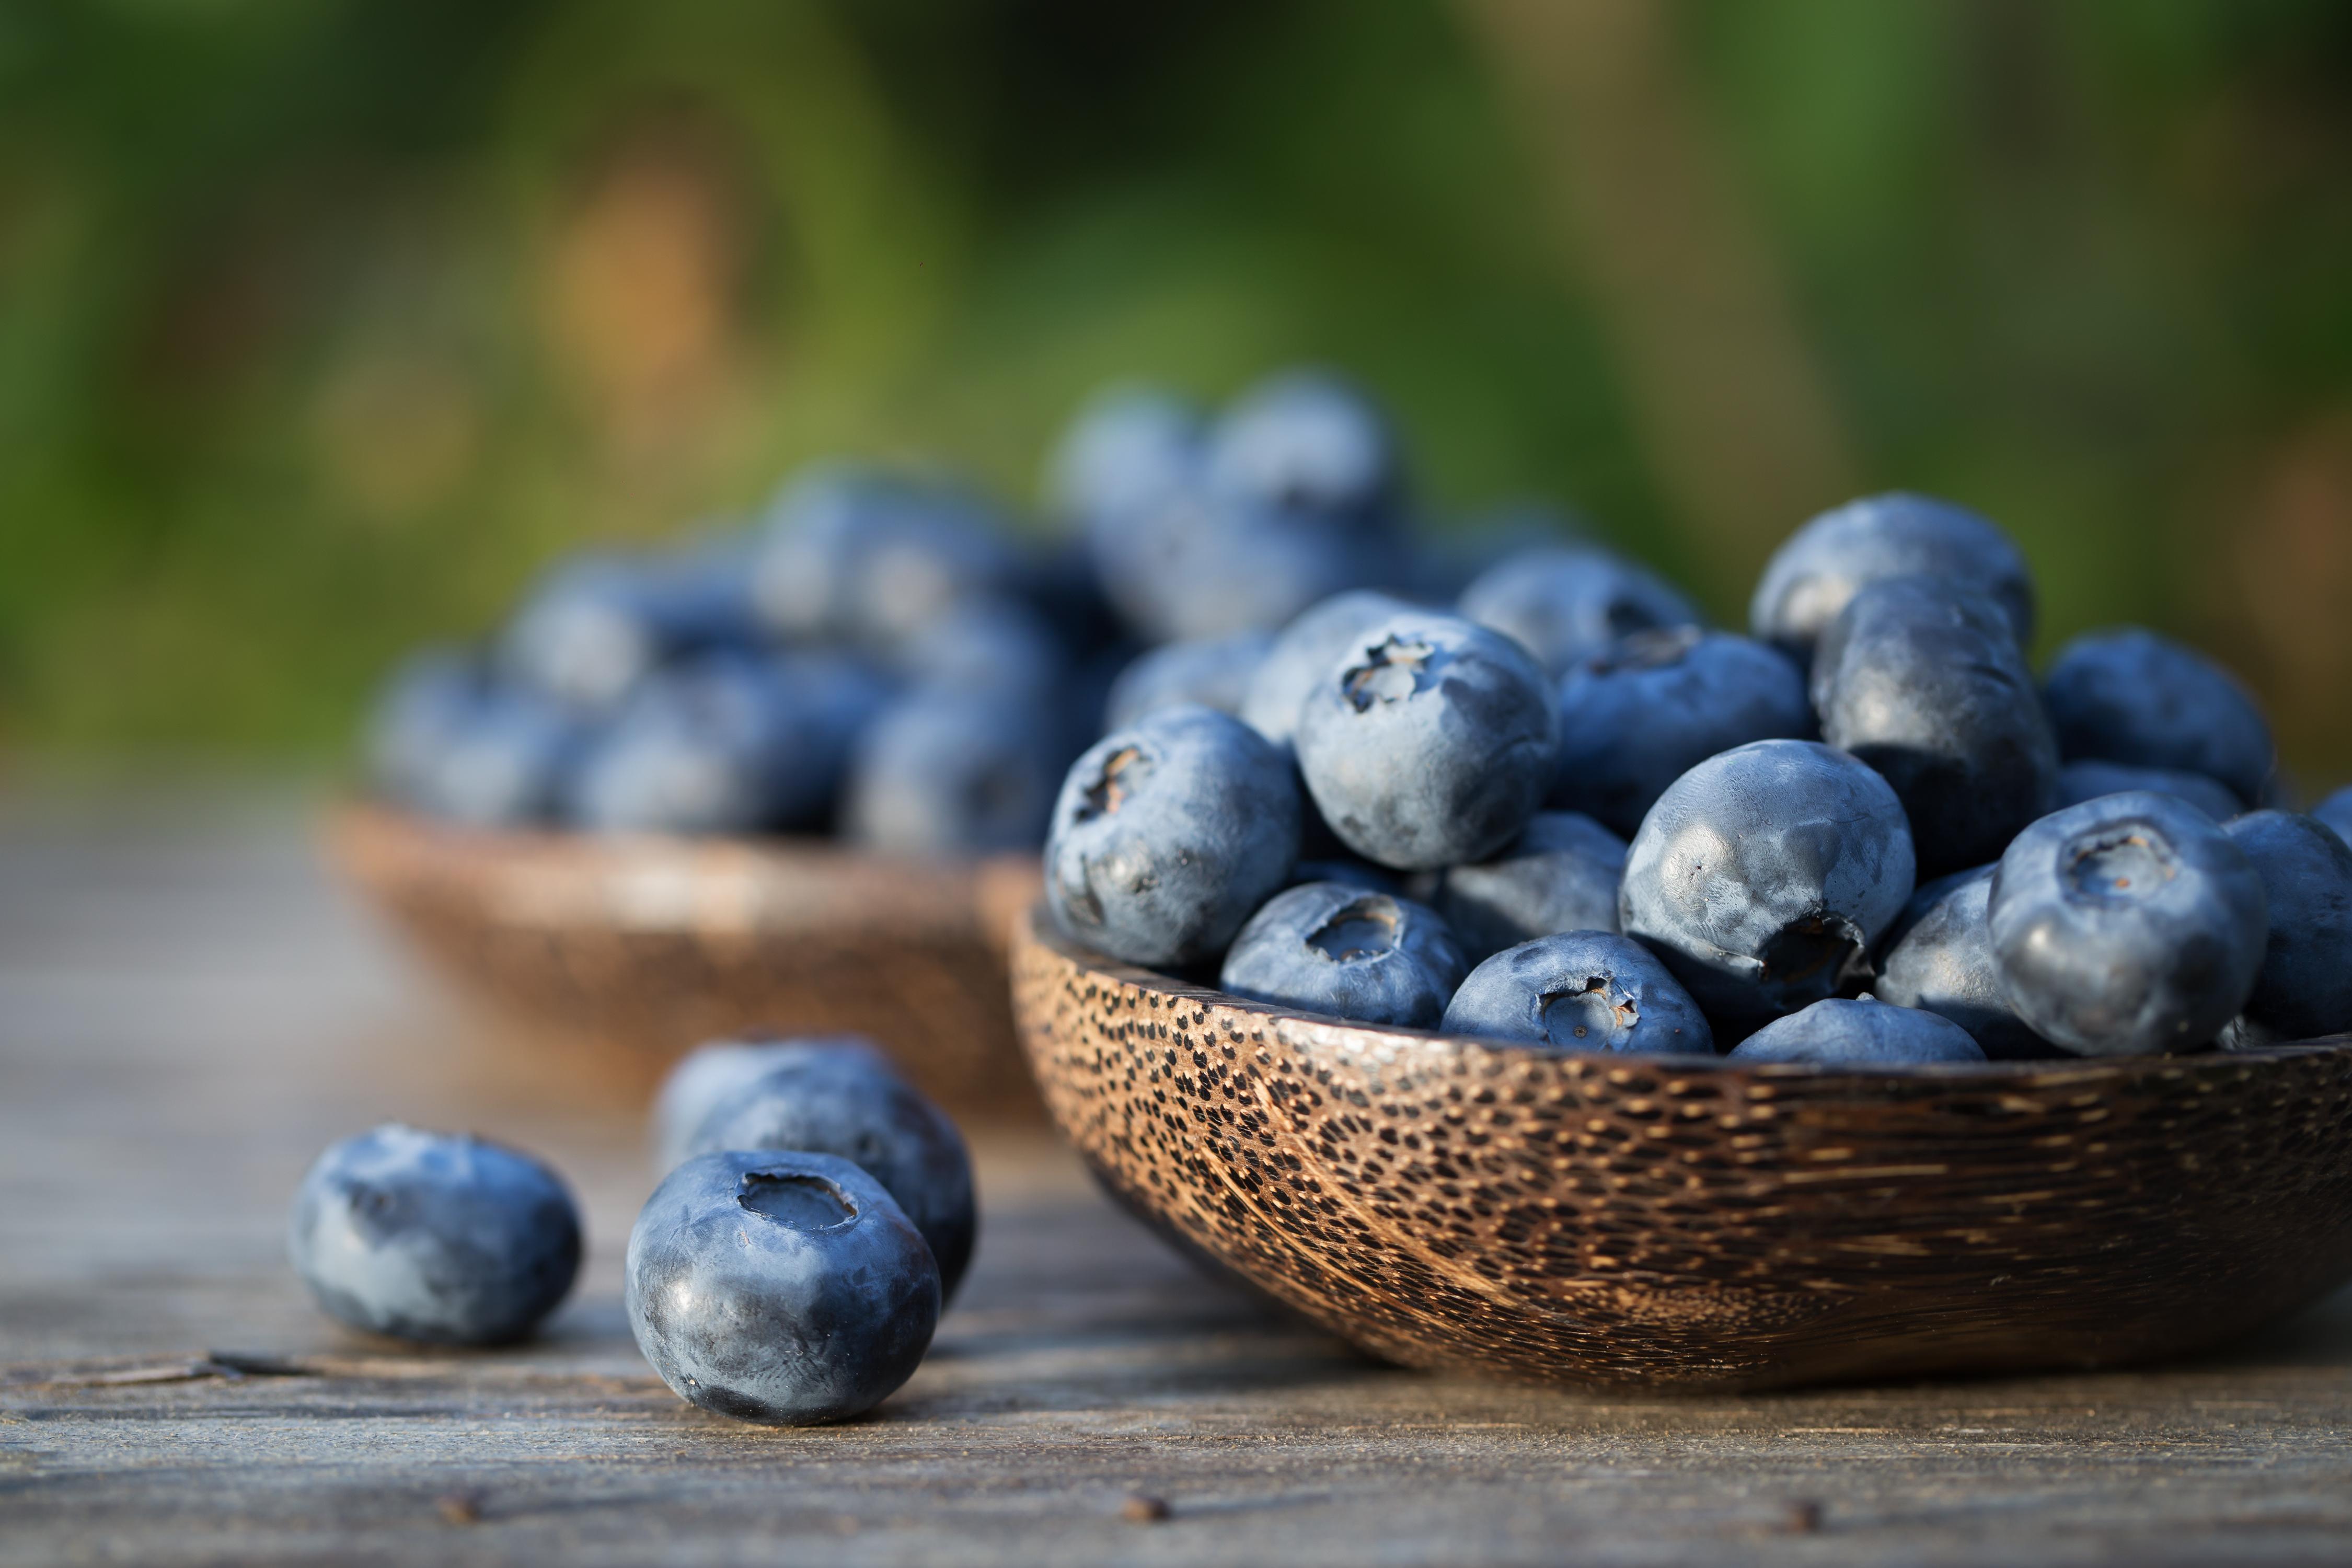 blueberries getty